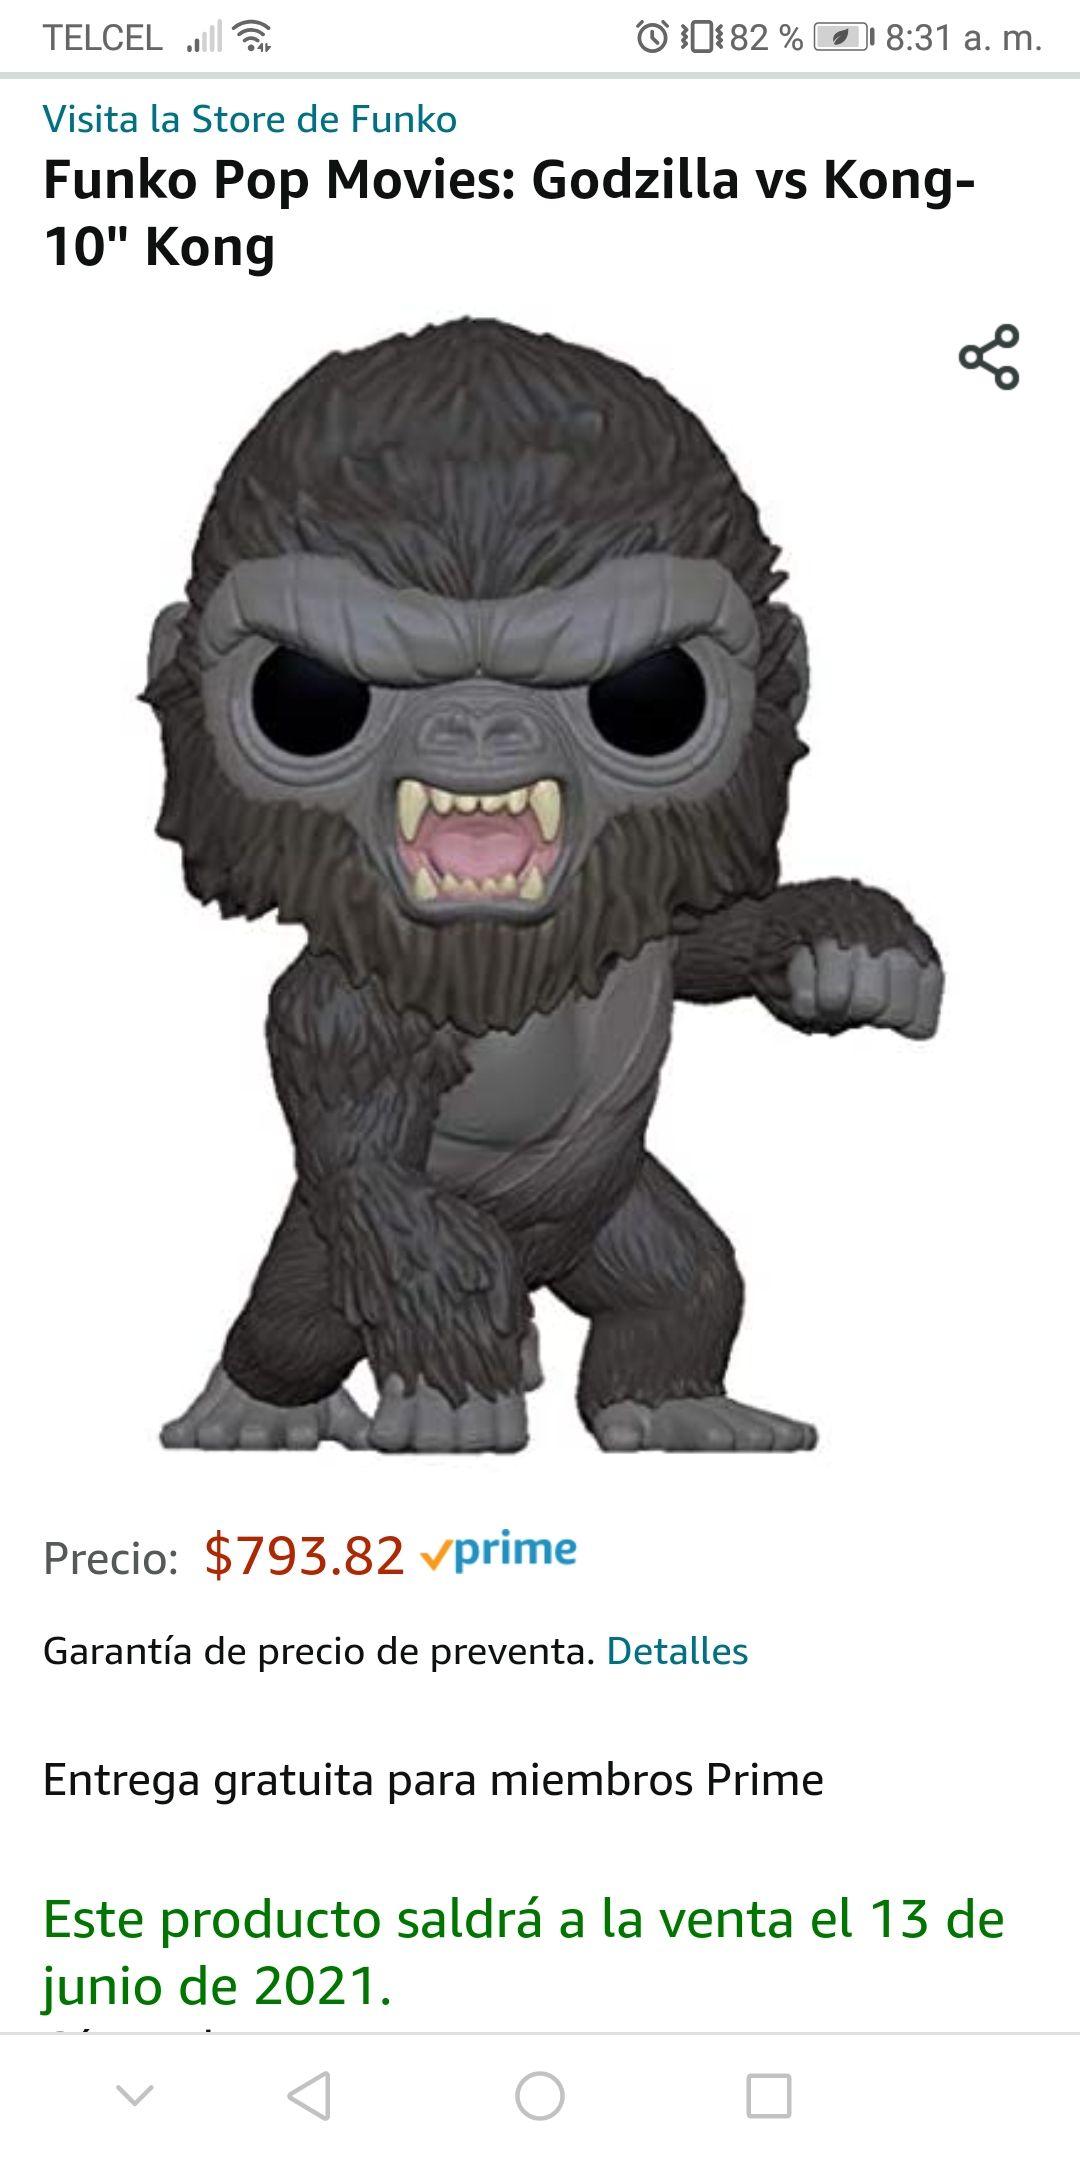 "Amazon, RESERVA: Funko Pop Movies: Godzilla vs Kong- 10"" Kong"